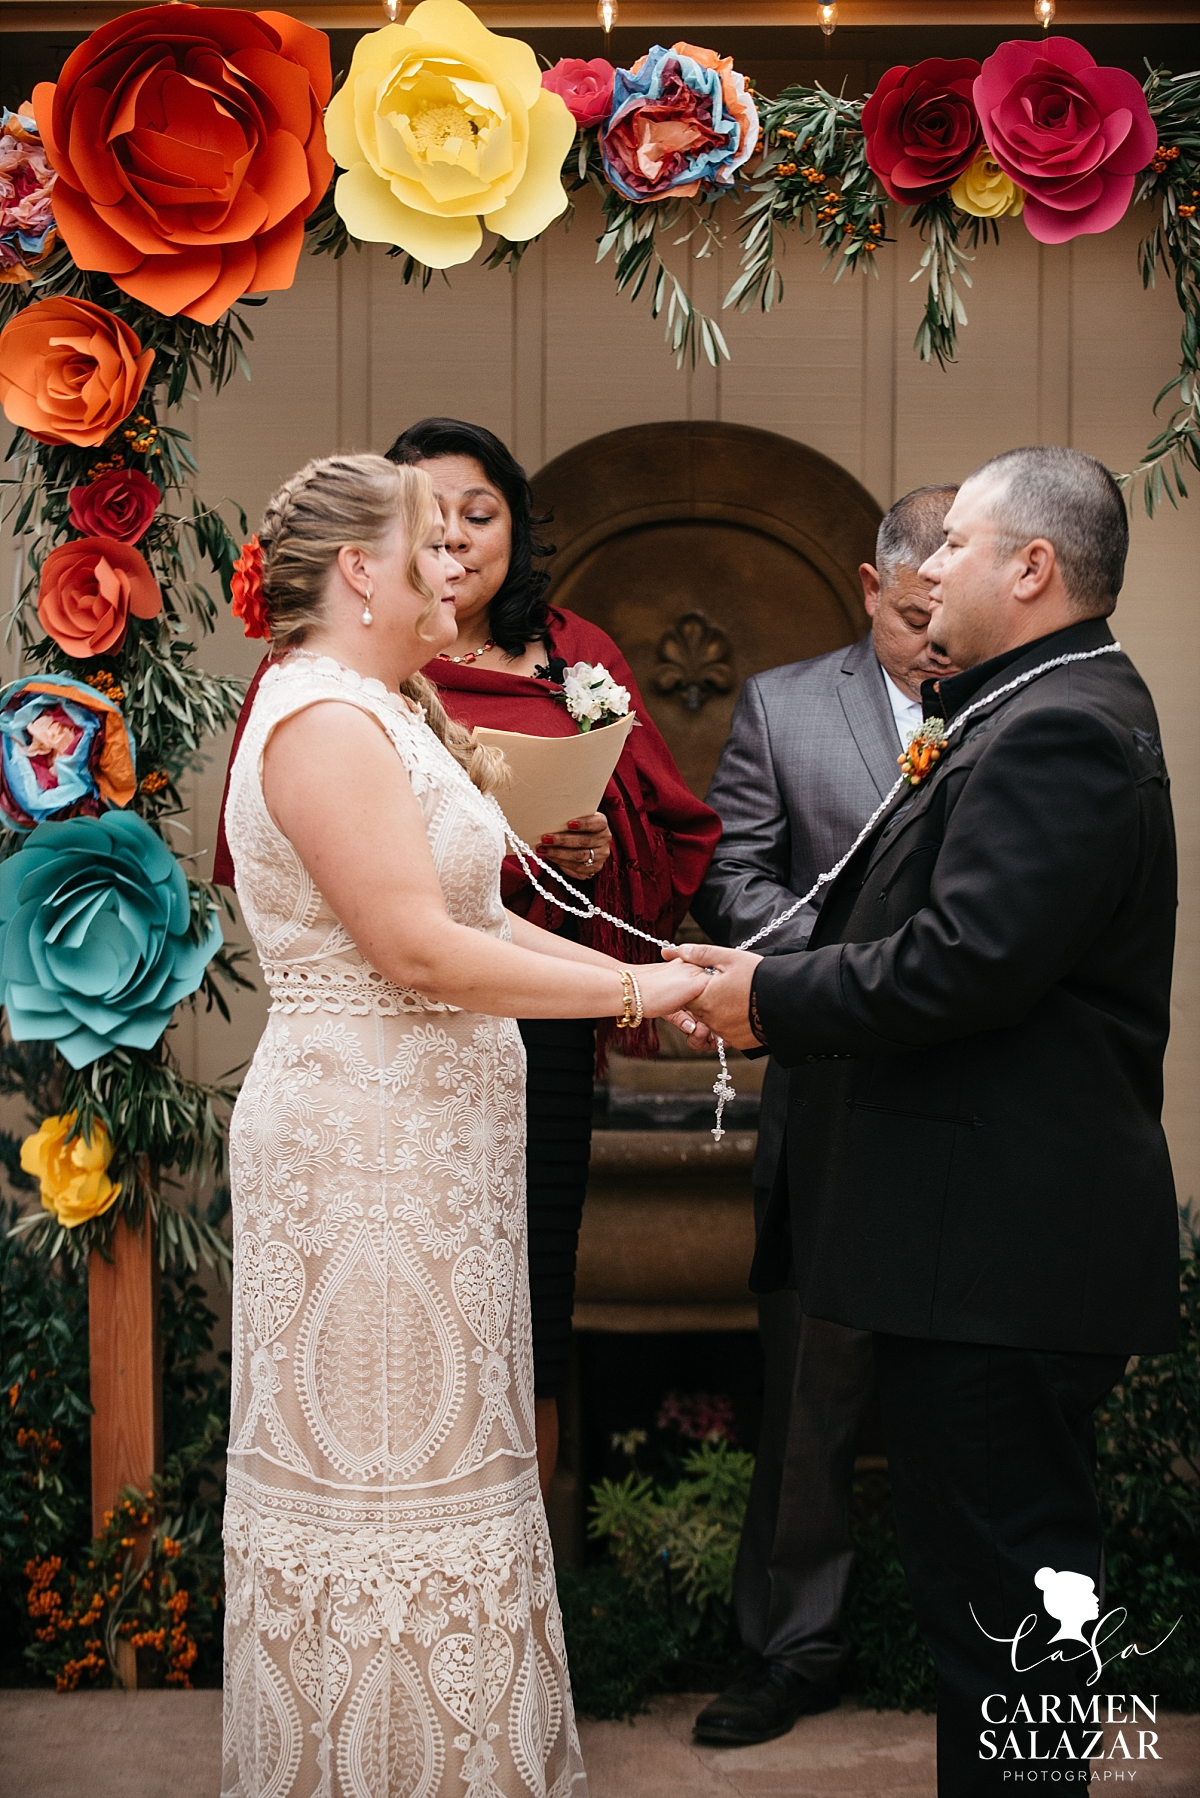 Mexican Catholic backyard wedding ceremony - Carmen Salazar